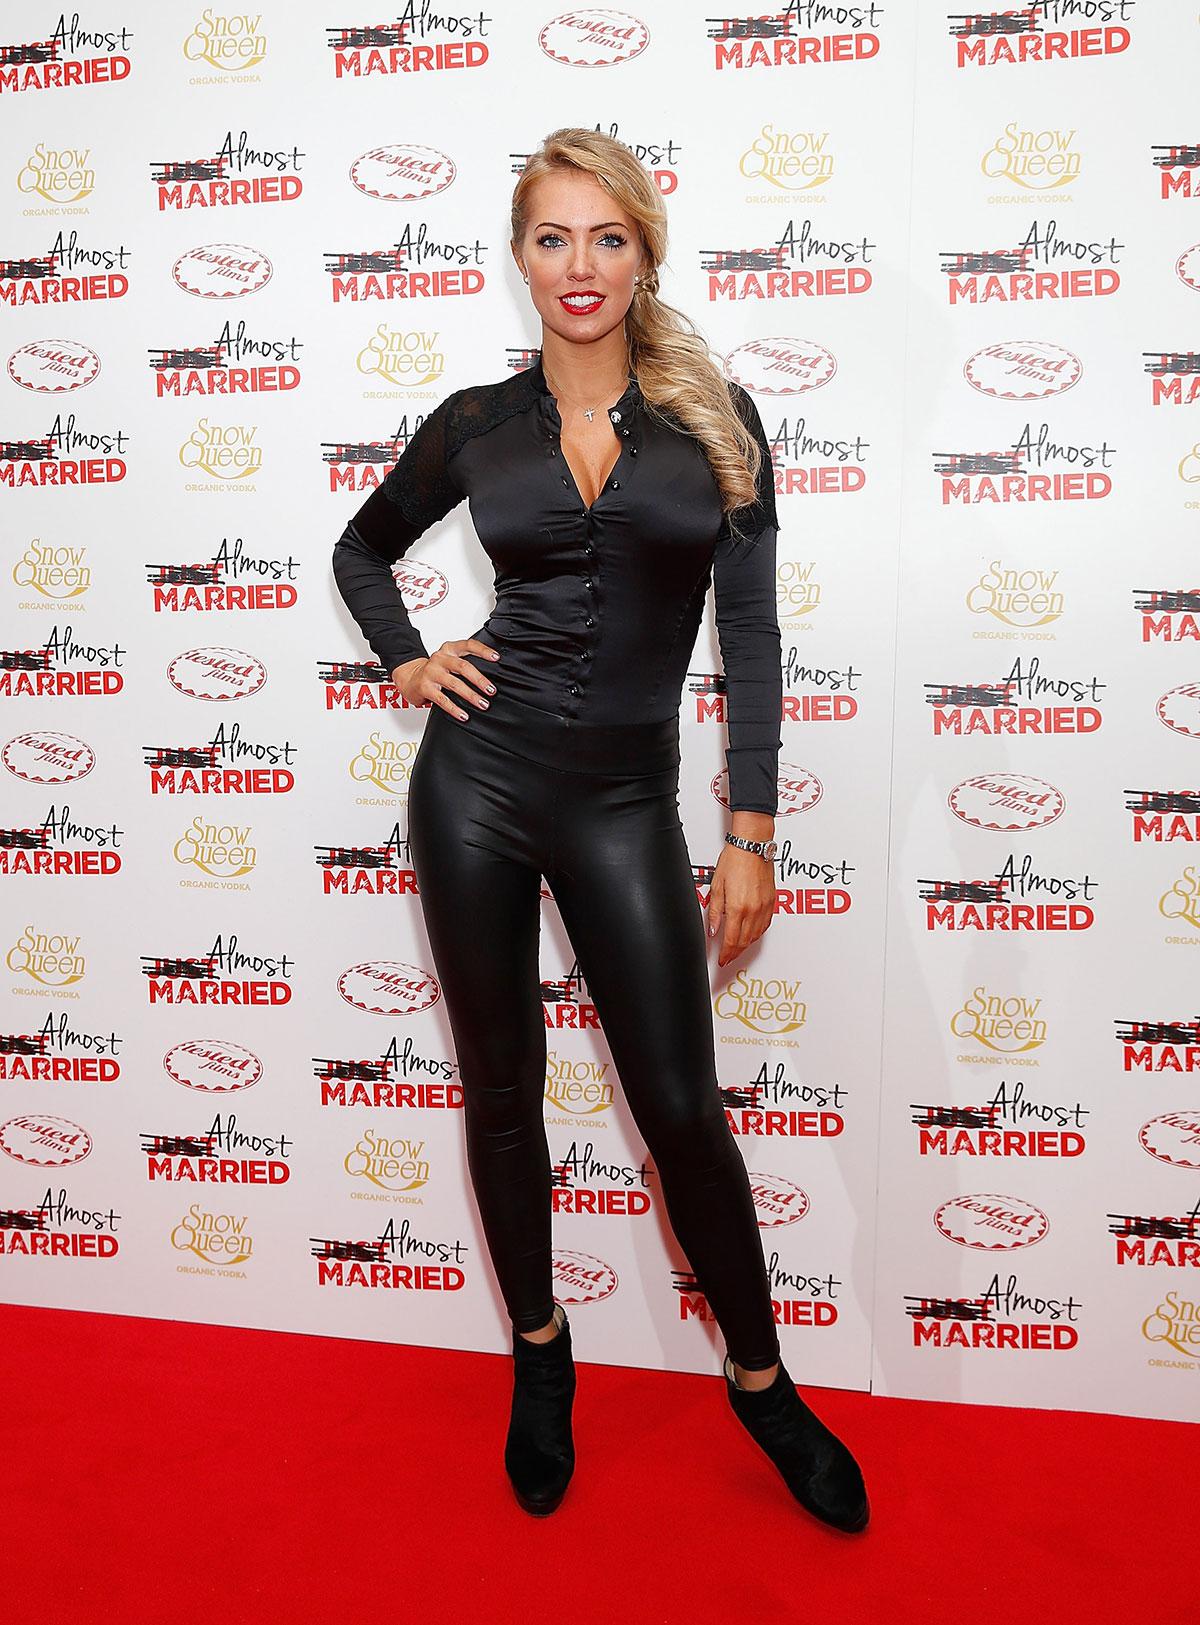 Aisleyne Horgan Wallace attends UK Gala screening of Almost Married